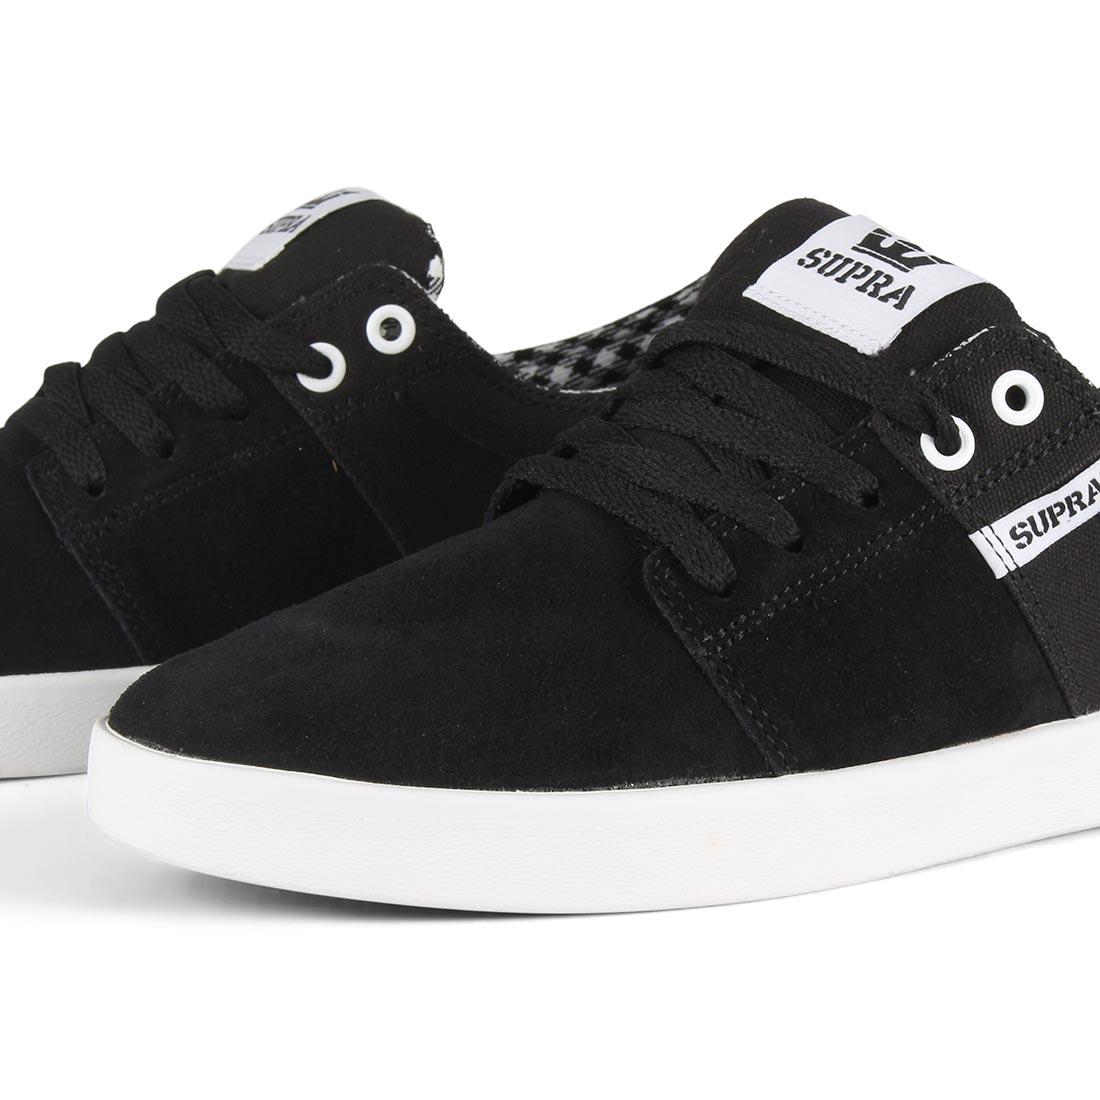 34b9bea356 Supra Stacks II Shoes - Black / White / White